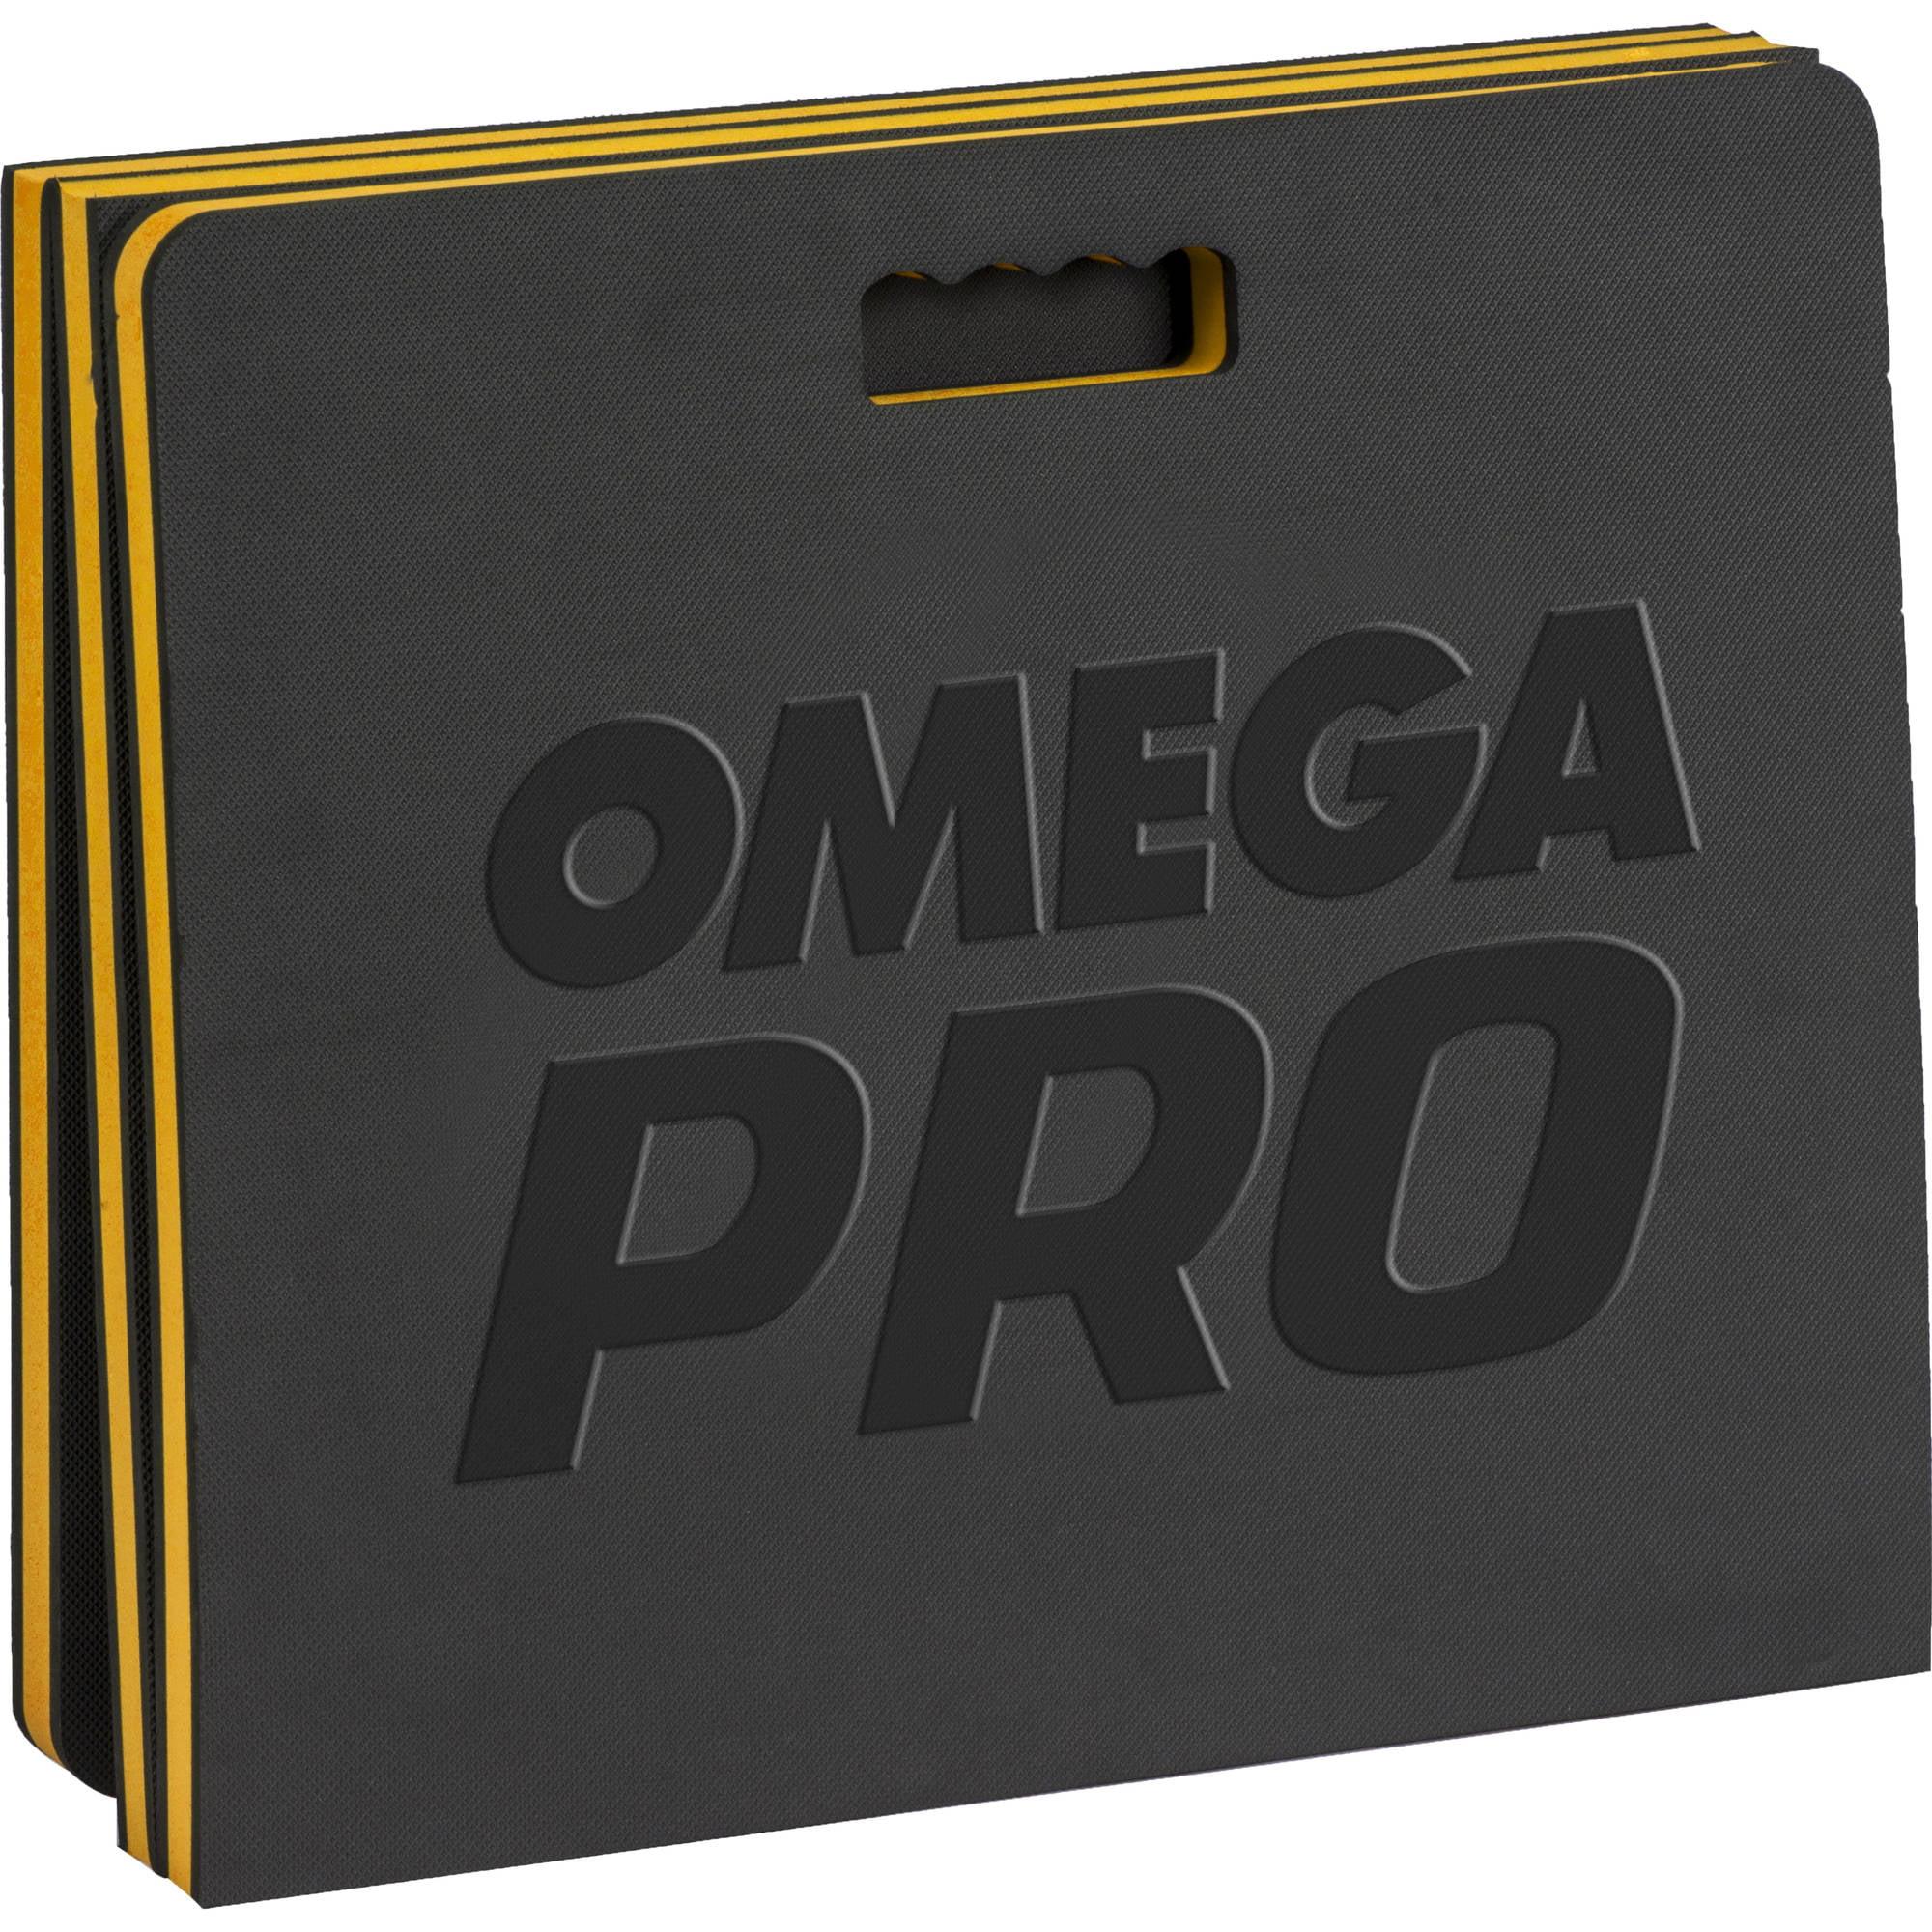 Omega Pro 85001 3-Fold EVA Pad with 21 LED Light